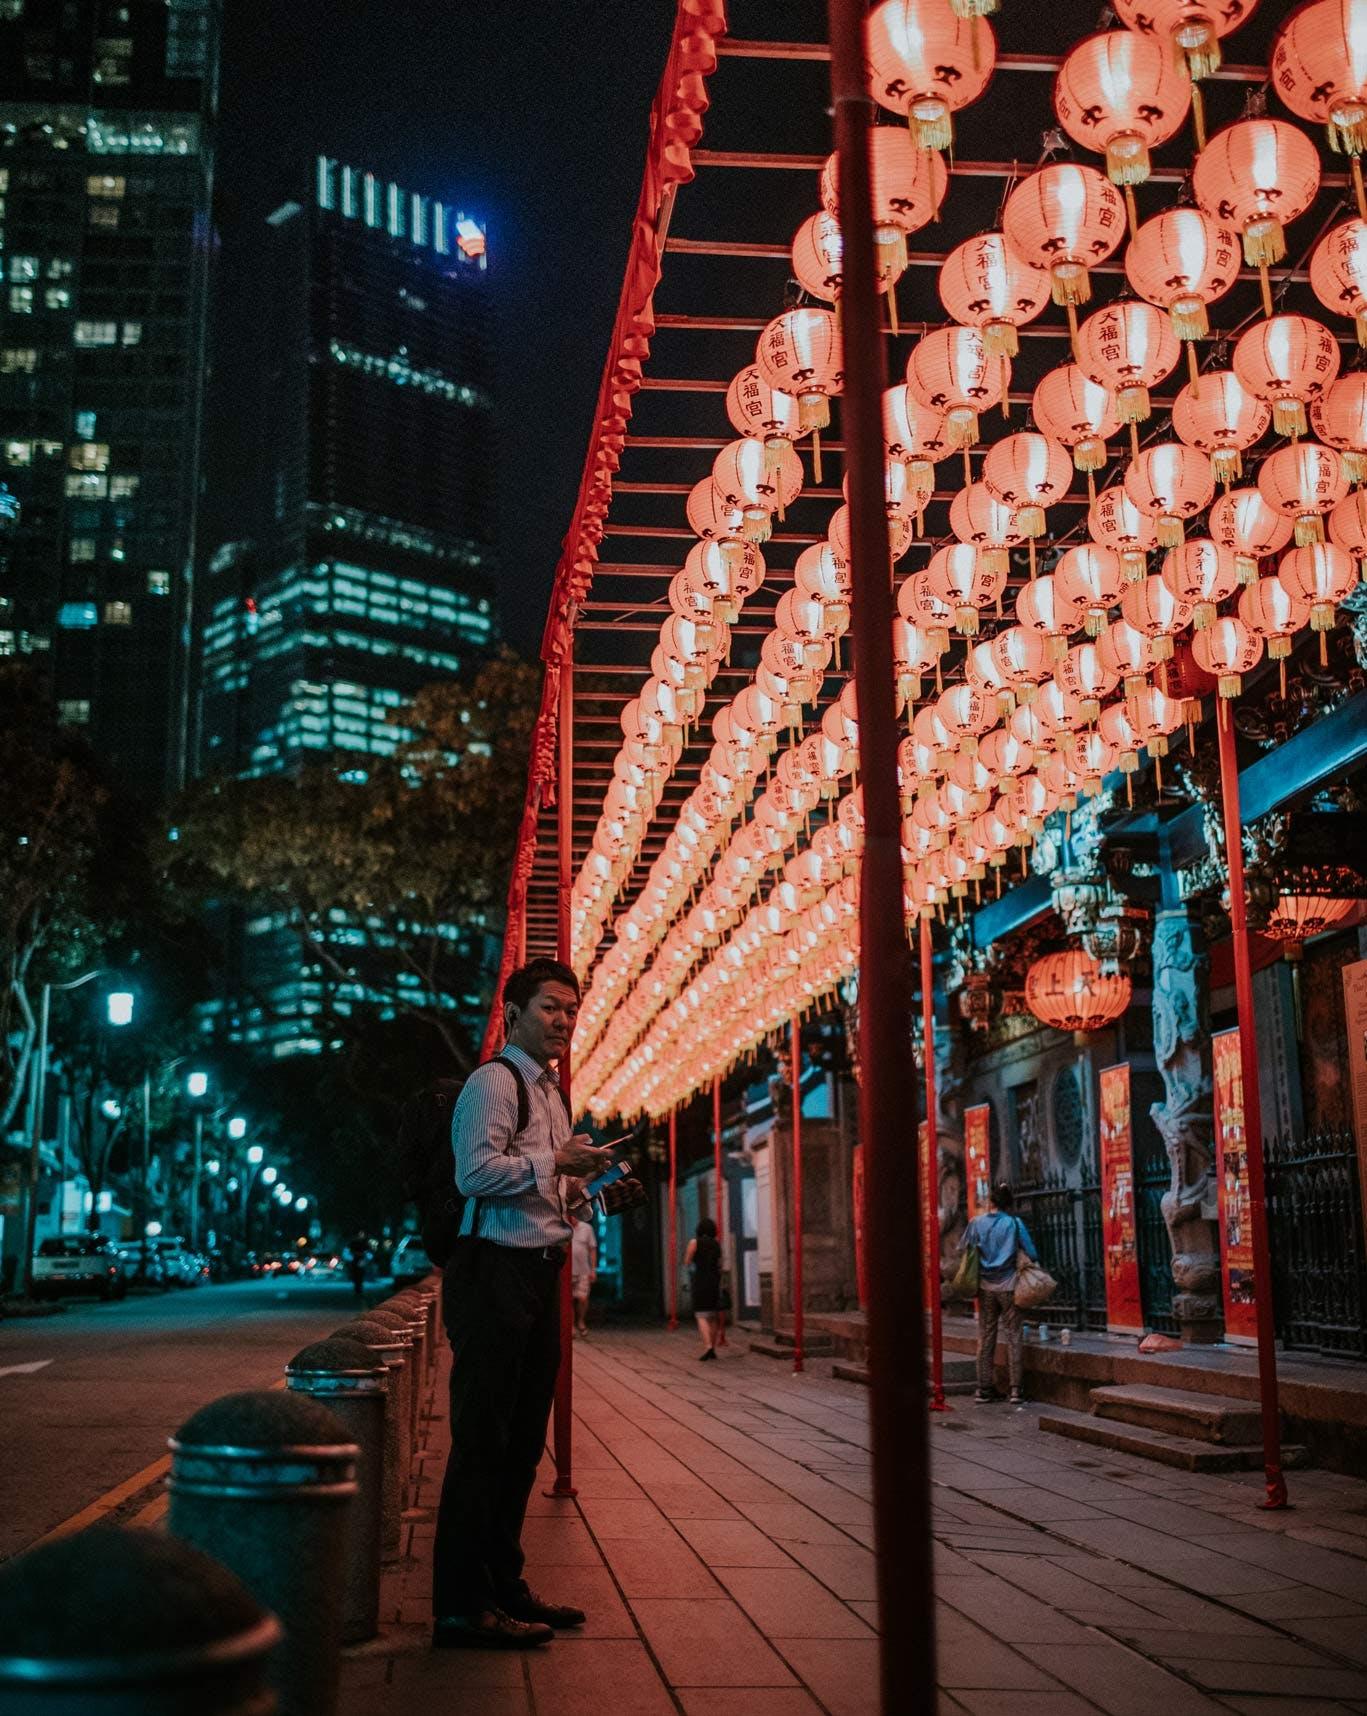 Thian Hock Keng Temple Lanterns & Gucco Tower